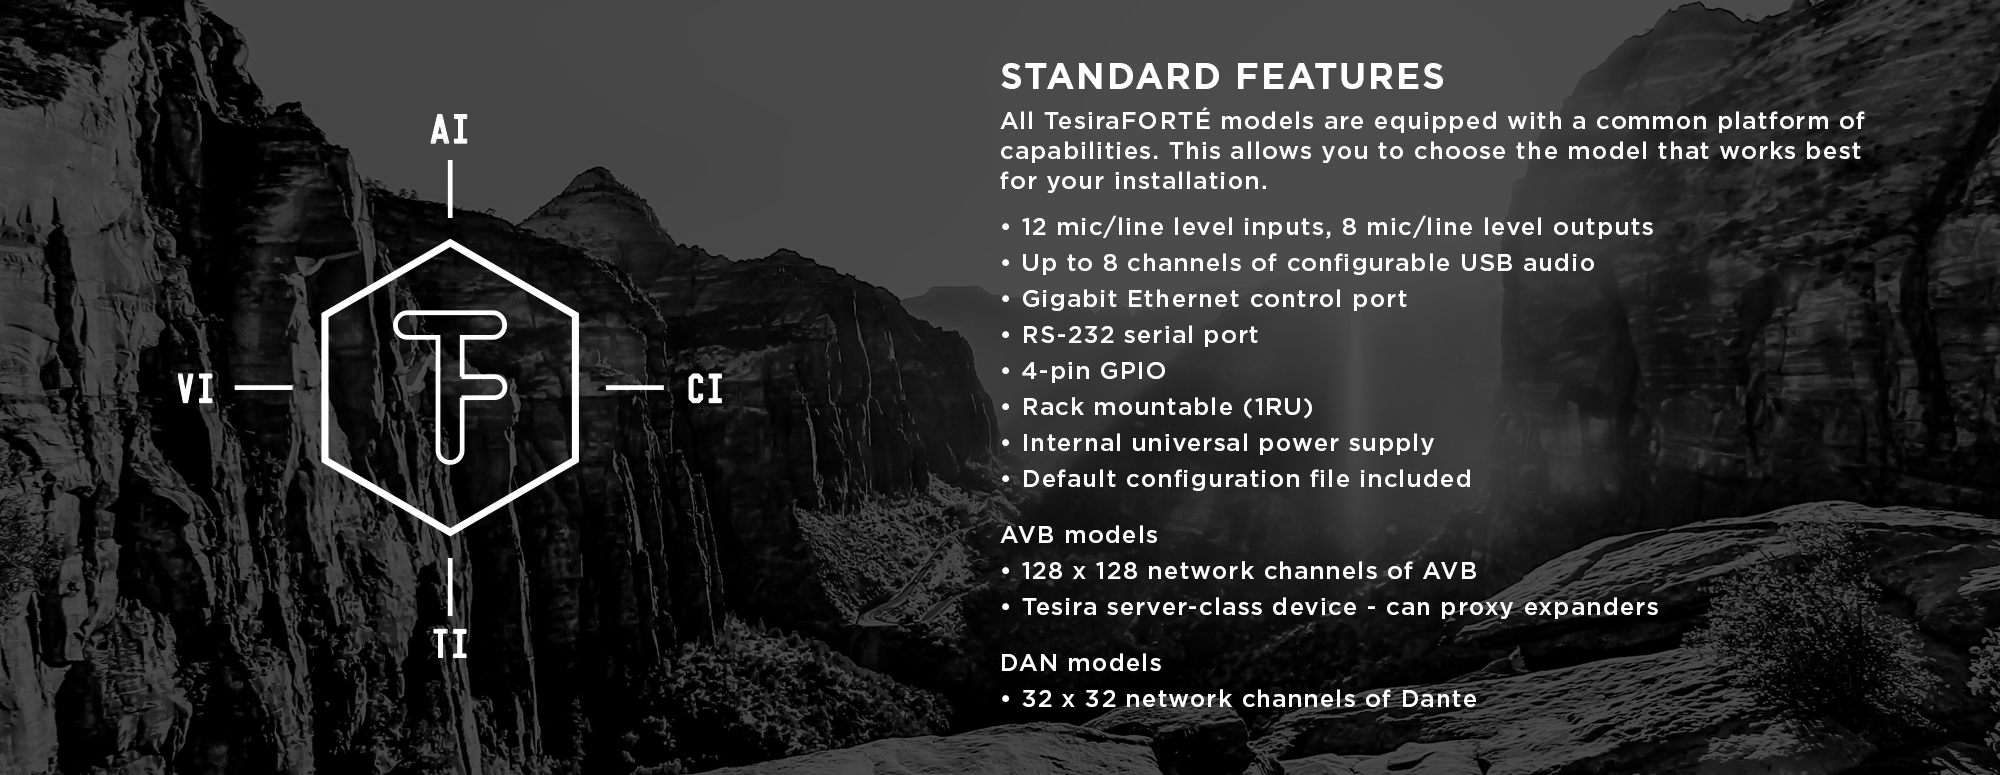 Standard Features on all TesiraFORTE models